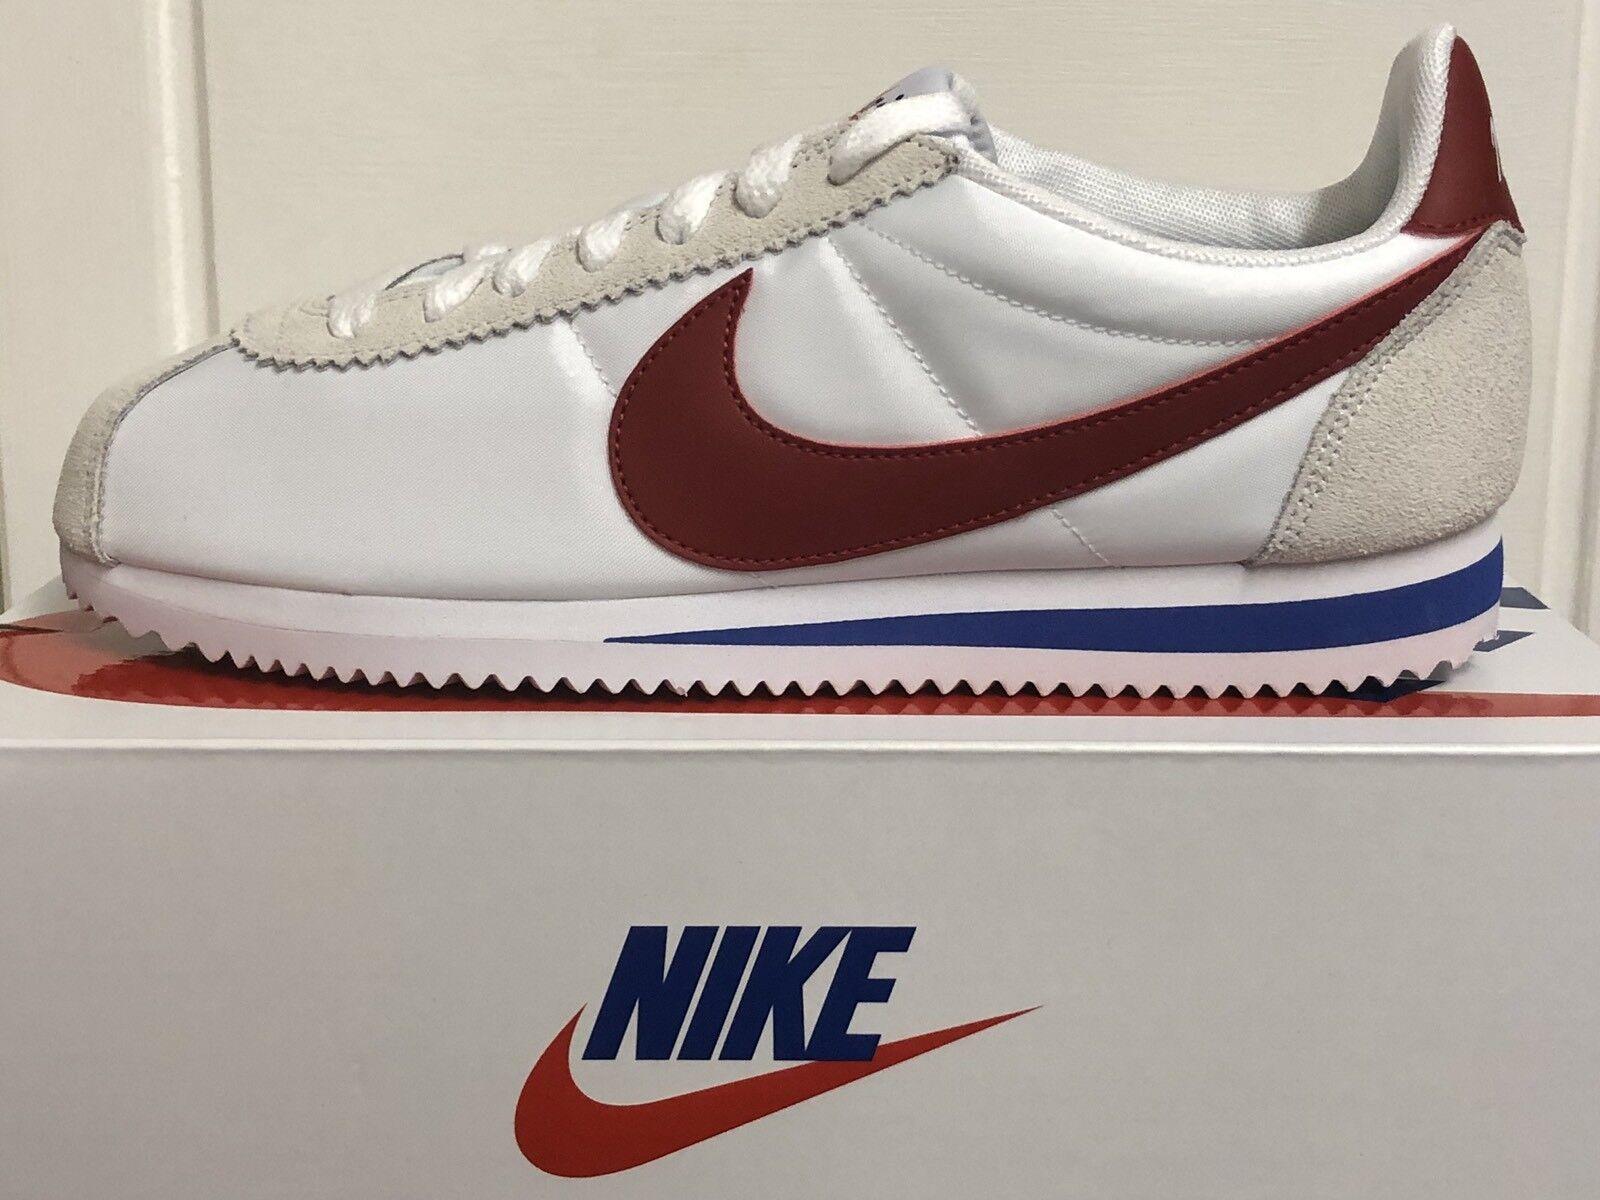 Nike Classic Cortez Nylon Baskets Baskets chaussures femme UK3, 5 Eu36, 5 forestgump